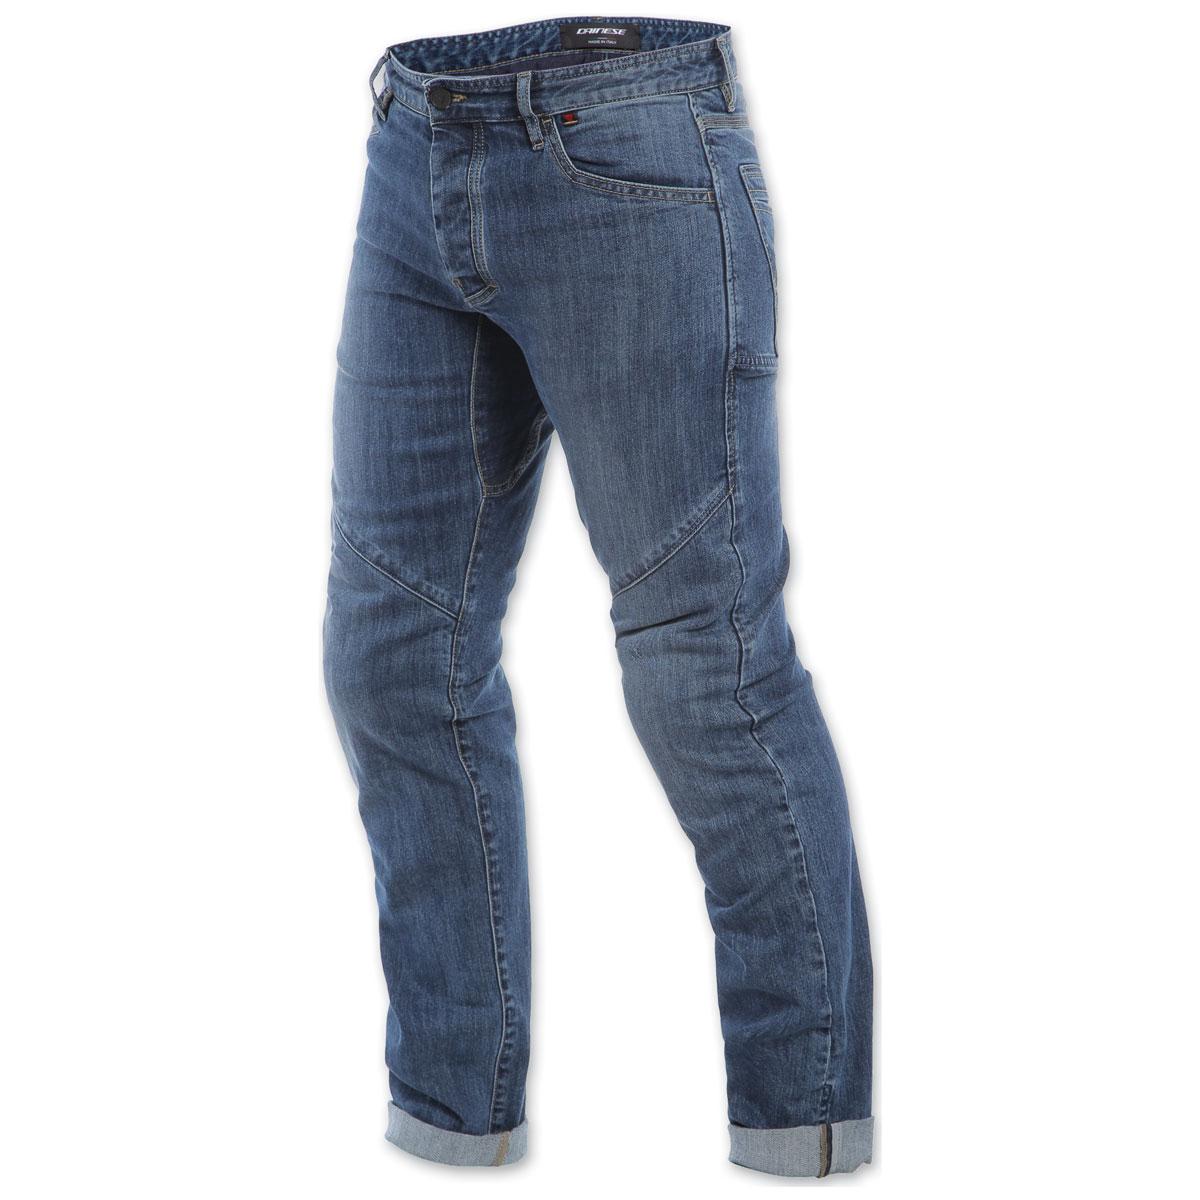 Dainese Men's Tivoli Medium Denim Jeans